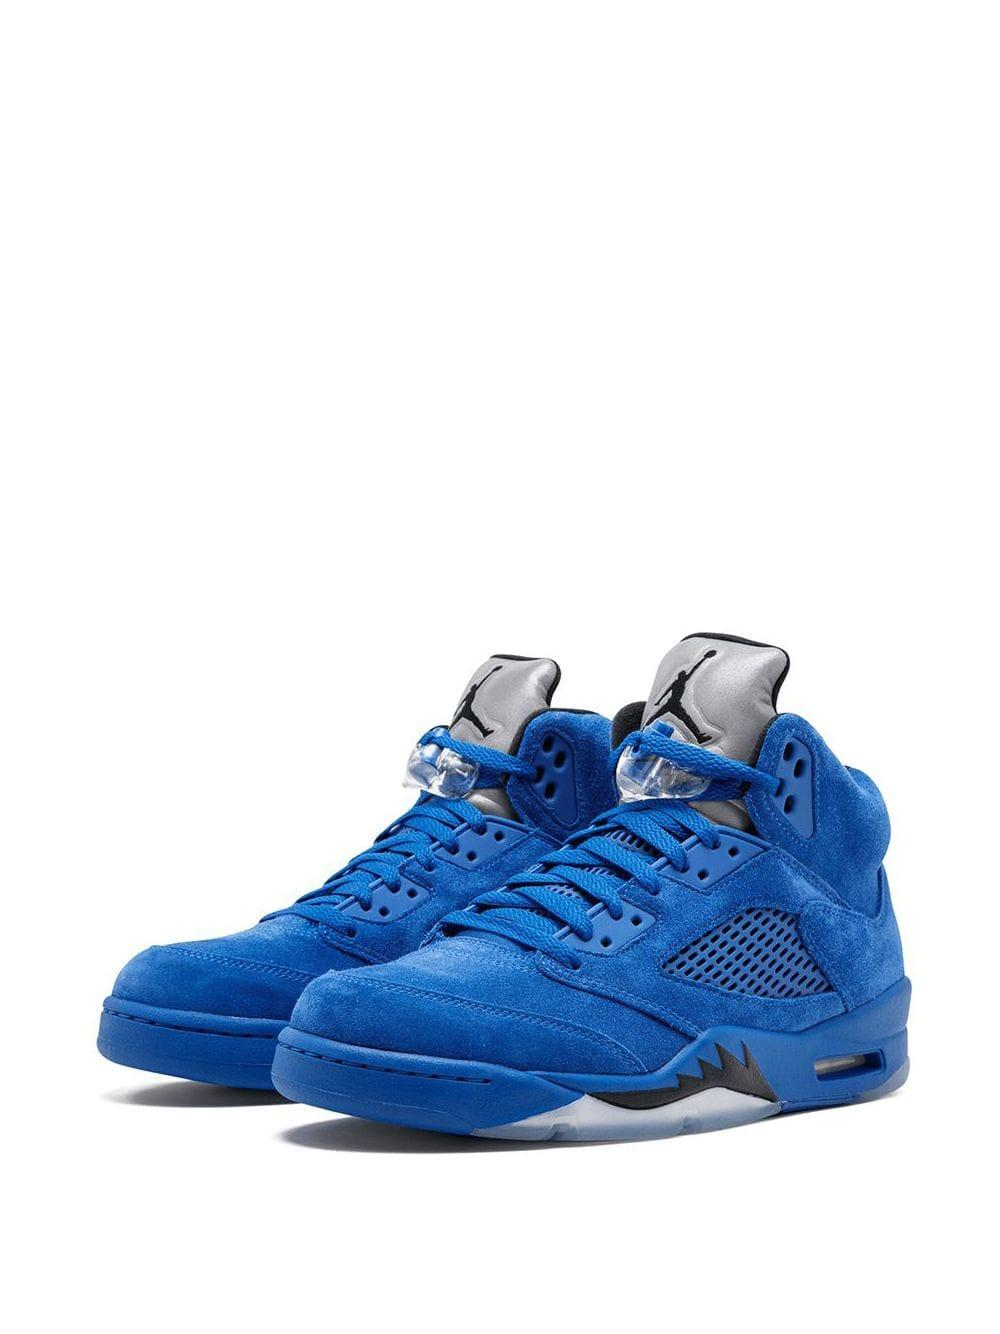 Zapatillas Air 5 Retro Nike de Caucho de color Azul para hombre